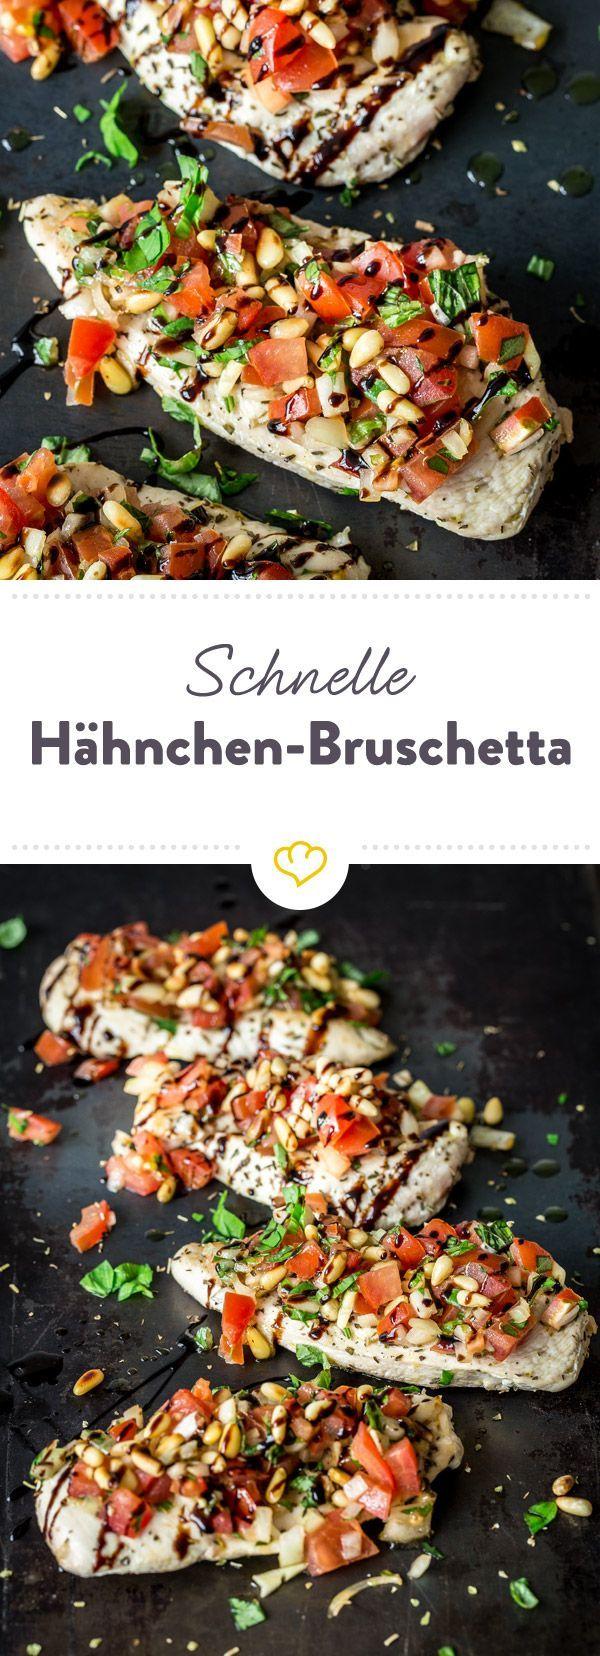 Photo of Quick chicken bruschetta with balsamic reduction